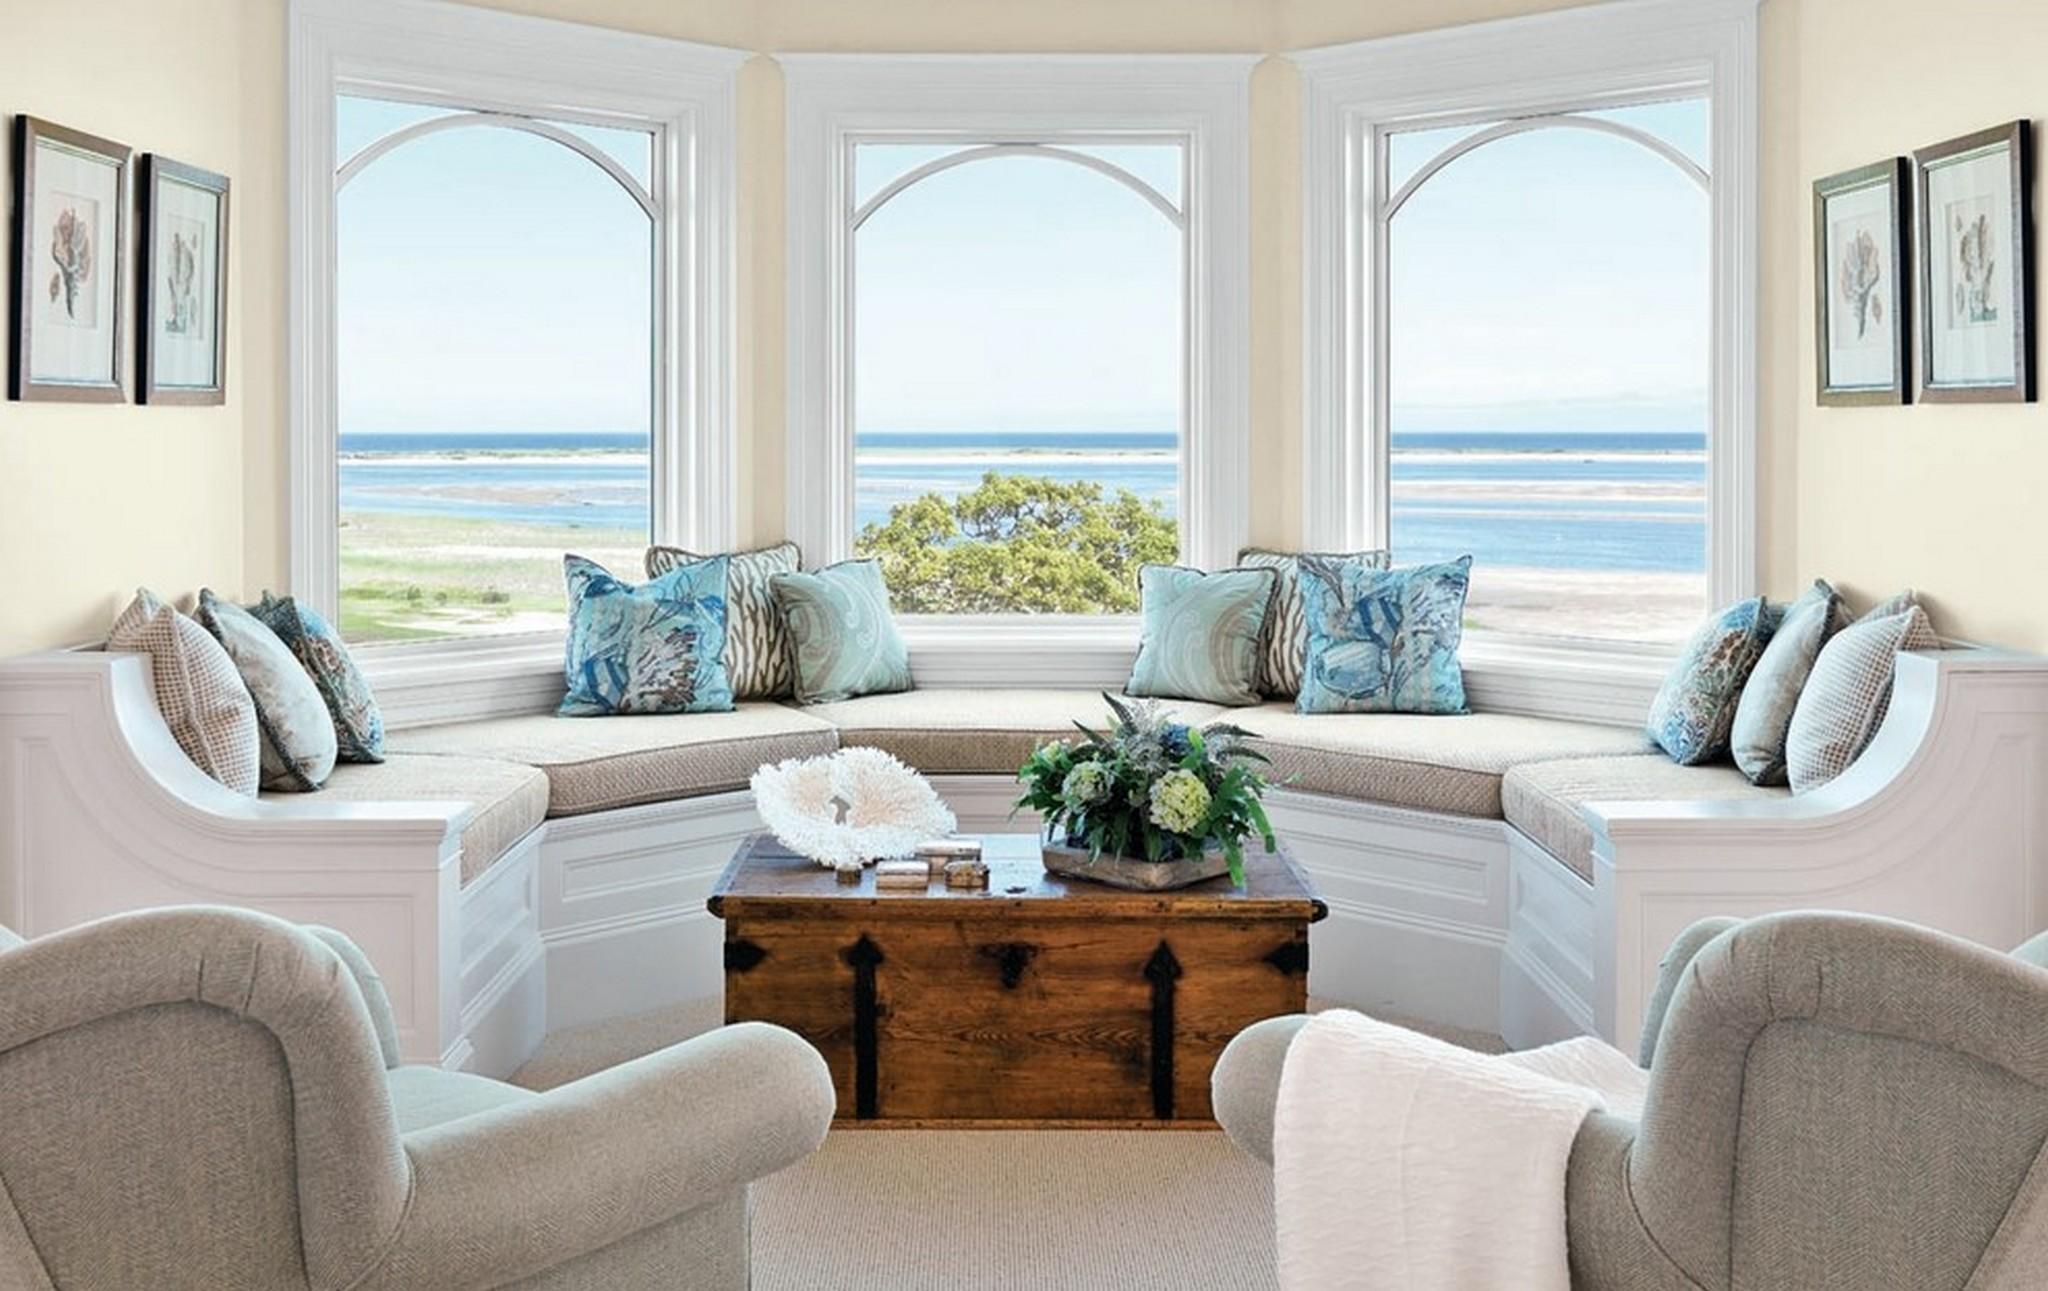 bay window sofa seating design minimalis 20 43 choices of sofas for ideas